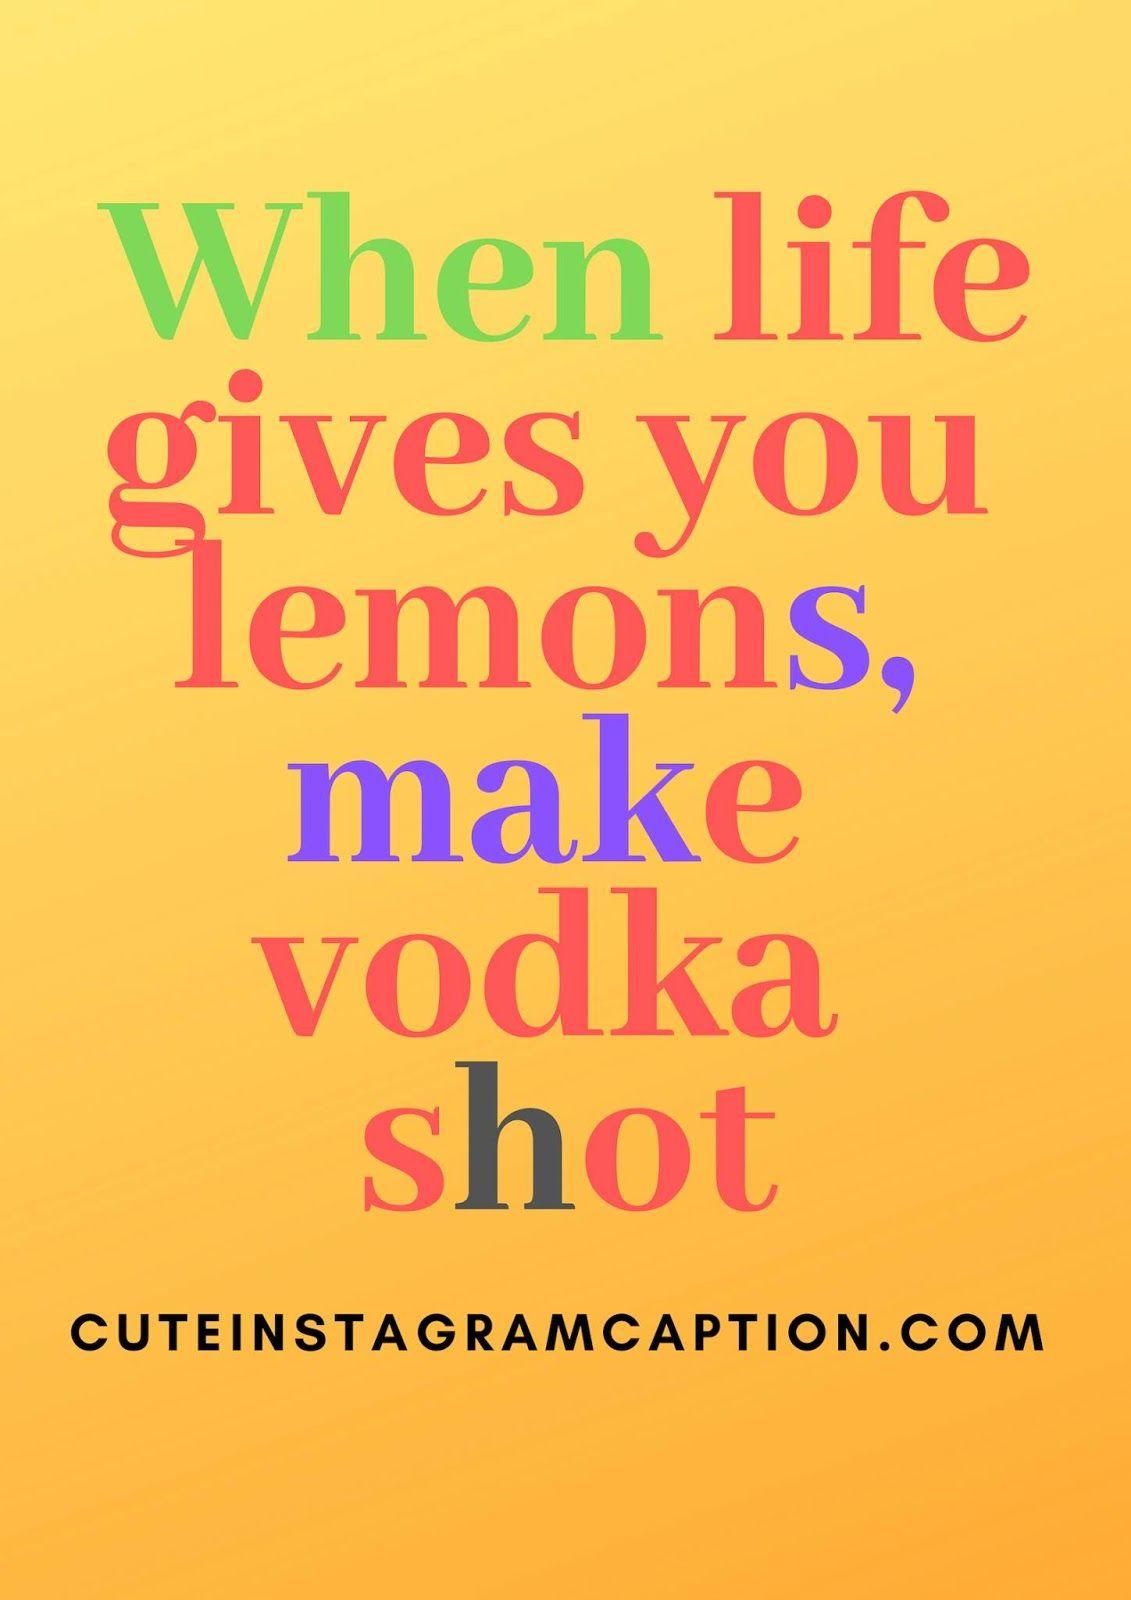 make vodka short   Blogs and Commendable remarks   Selfie